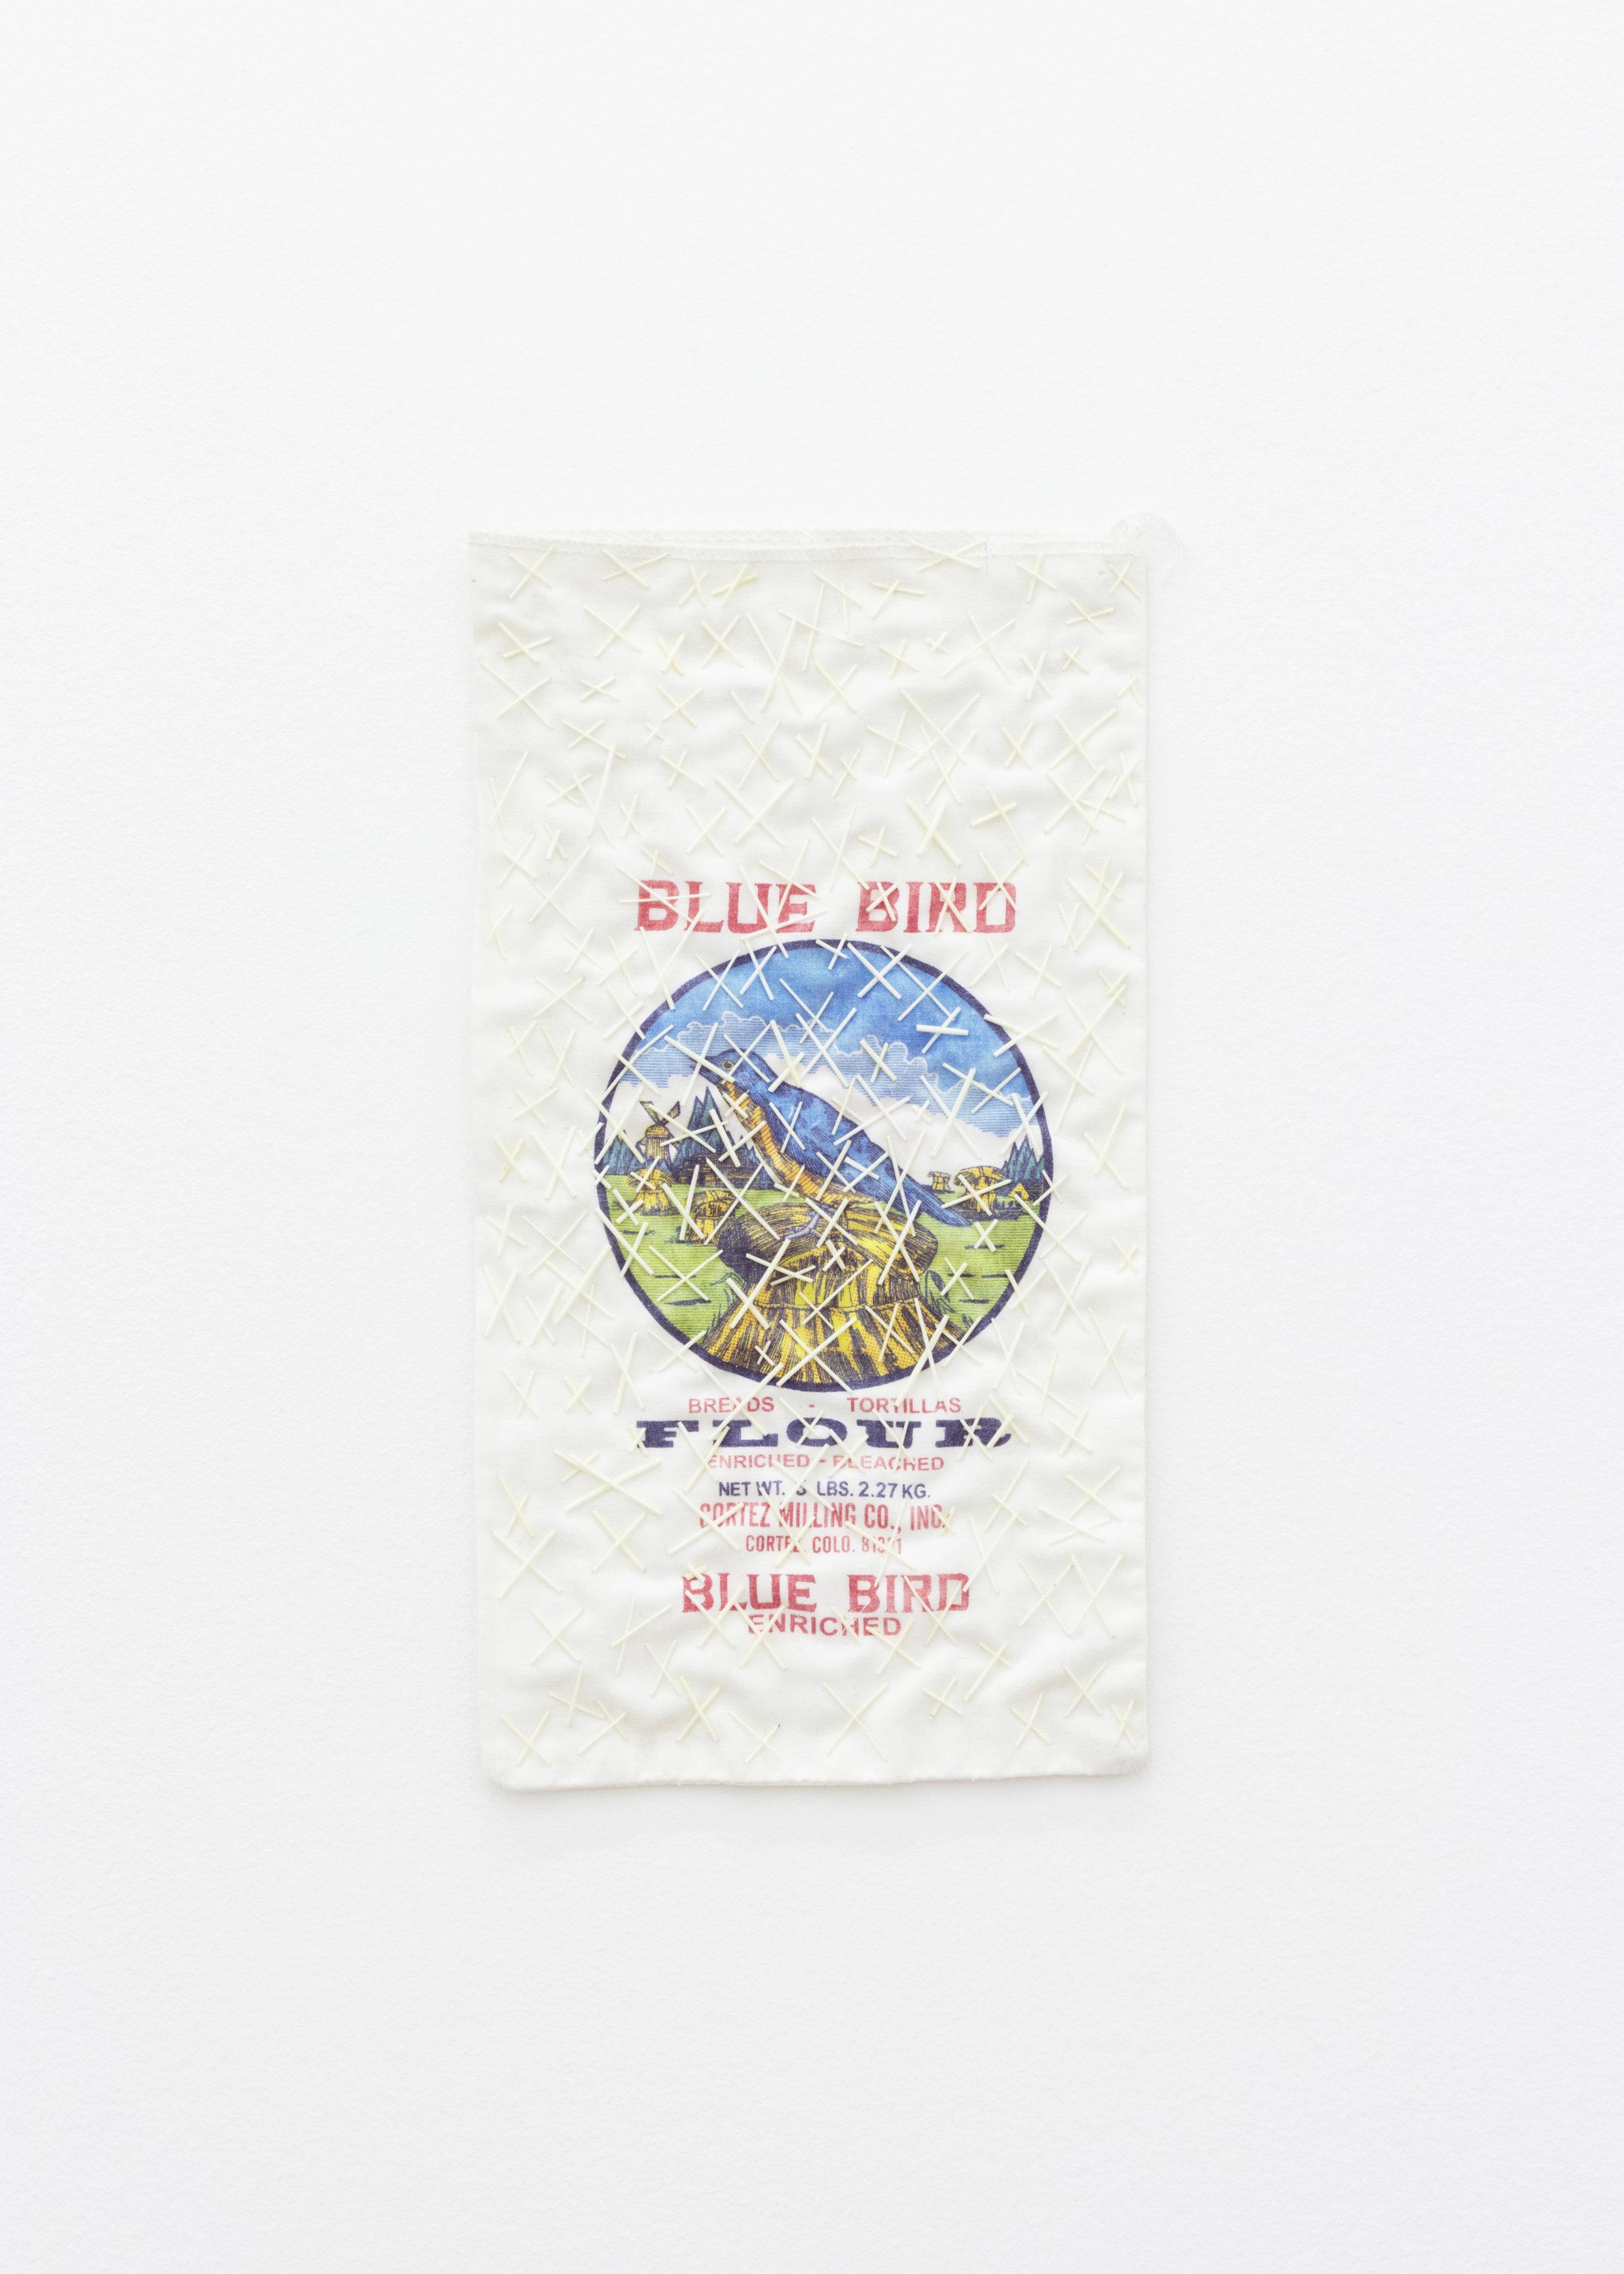 ... his x mark , 2019, Blue Bird Flour Bag, porcupine quills, thread, 15 x 8 in.